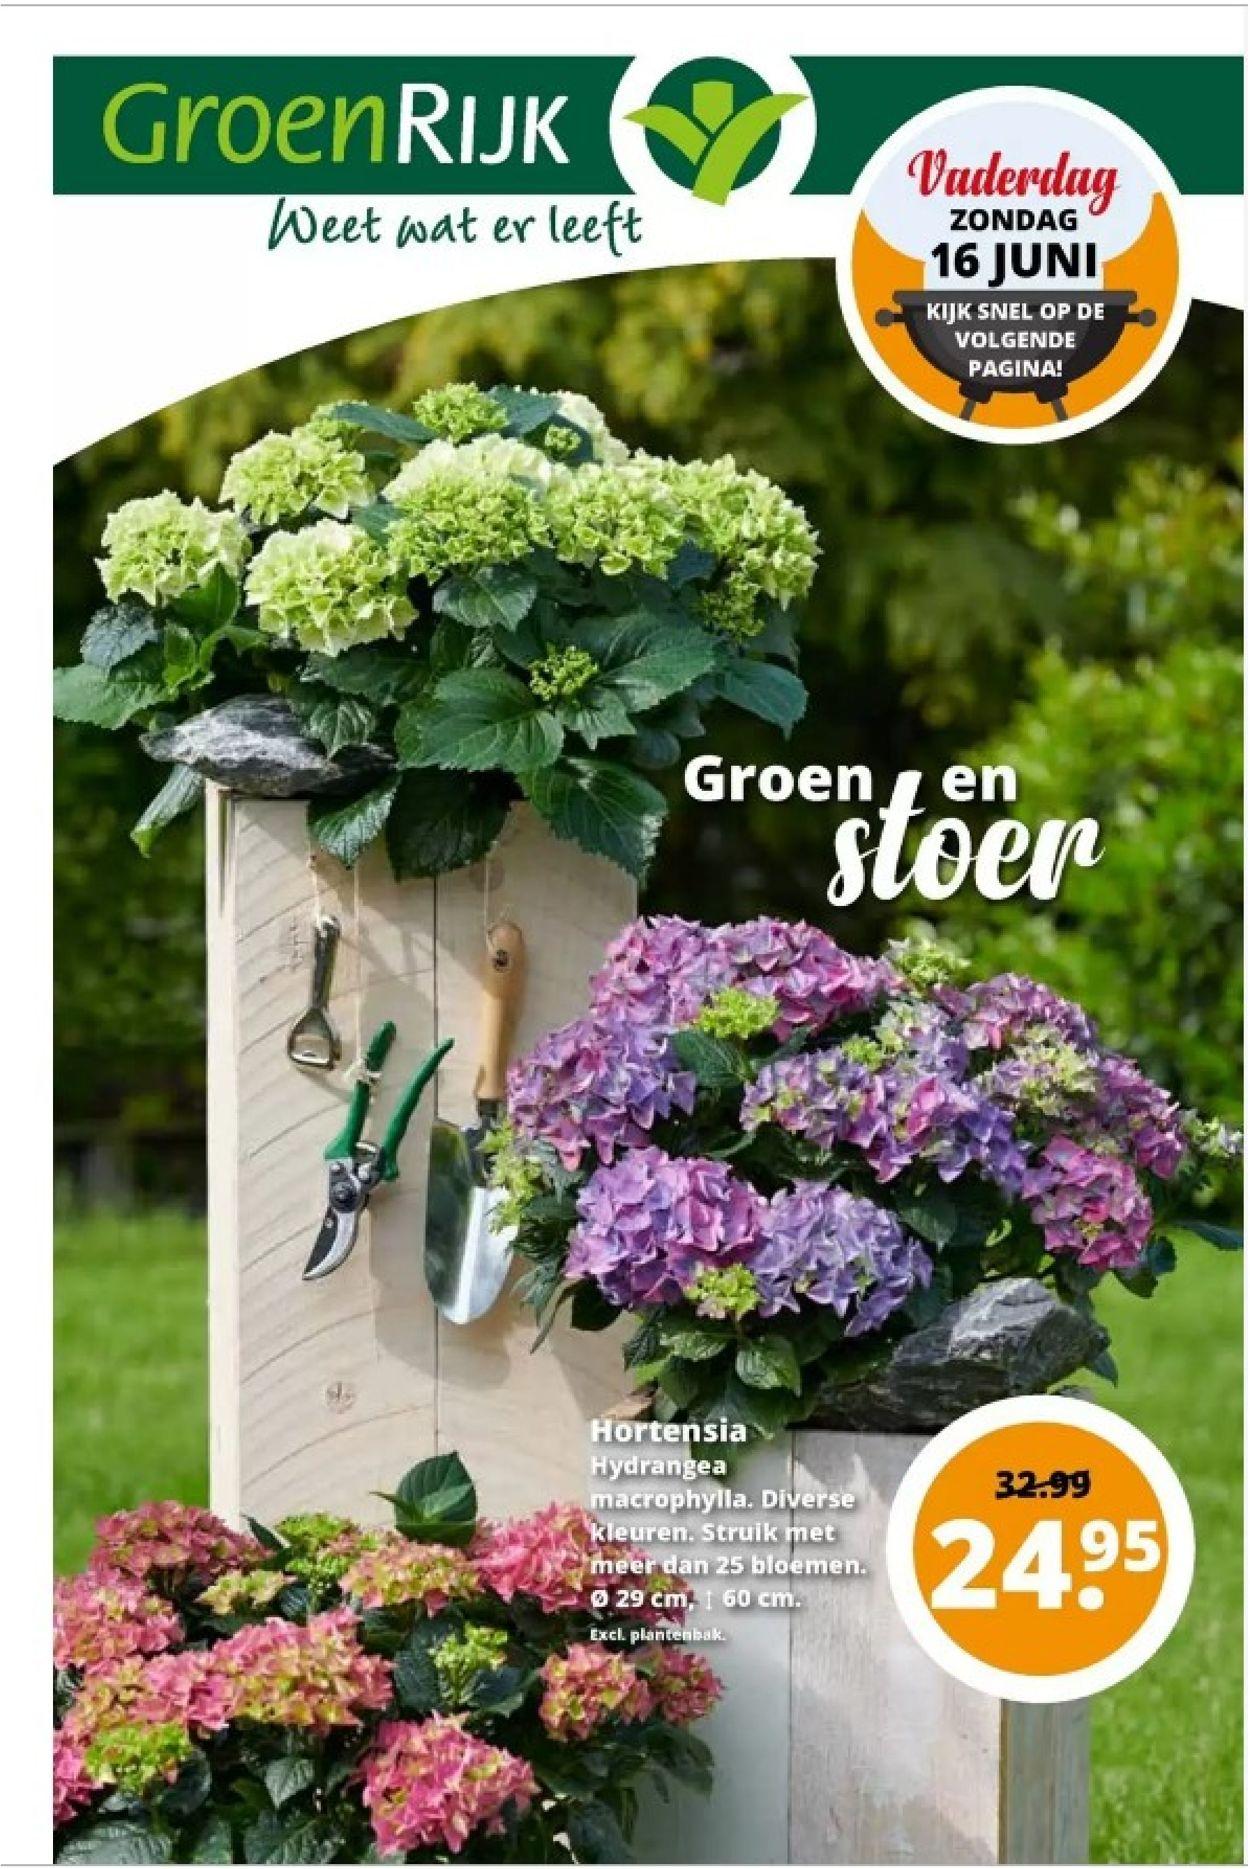 GroenRijk Folder - 12.06-18.06.2019